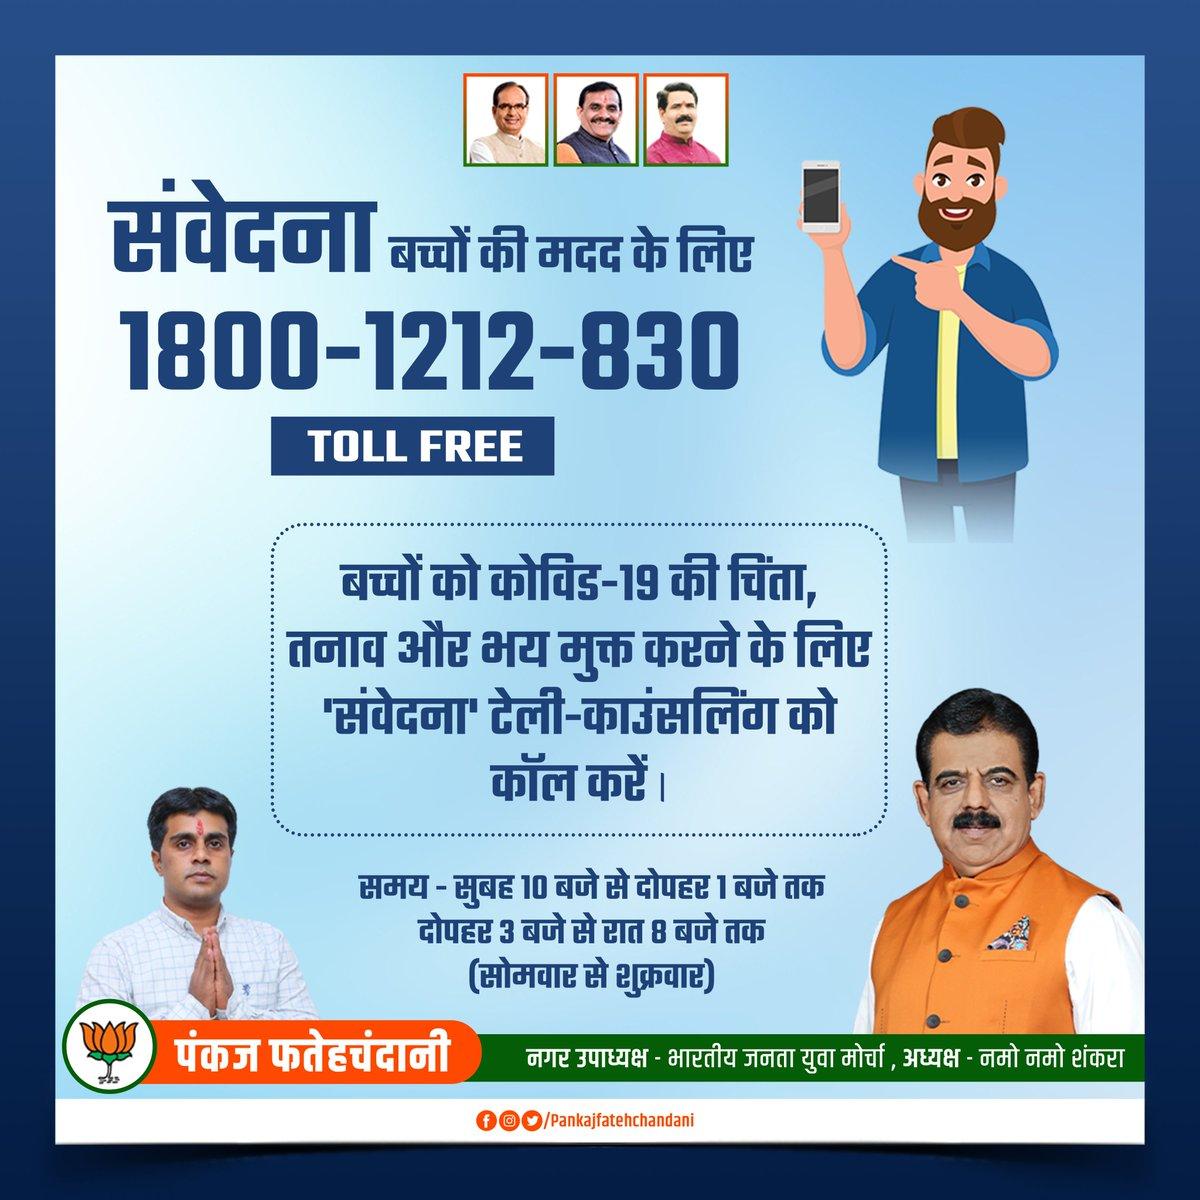 संवेदना बच्चों की मदद के लिए -1800-1212-830 #sanvedna #kids #tollfree #COVID19 #namonamoshankara #BJP4IND #ShankarLalwani #pankajfatehchandani #Indore @iShankarLalwani @ChouhanShivraj @vdsharmabjp @ChawdaJaypal https://t.co/QBlC2xDG3Y